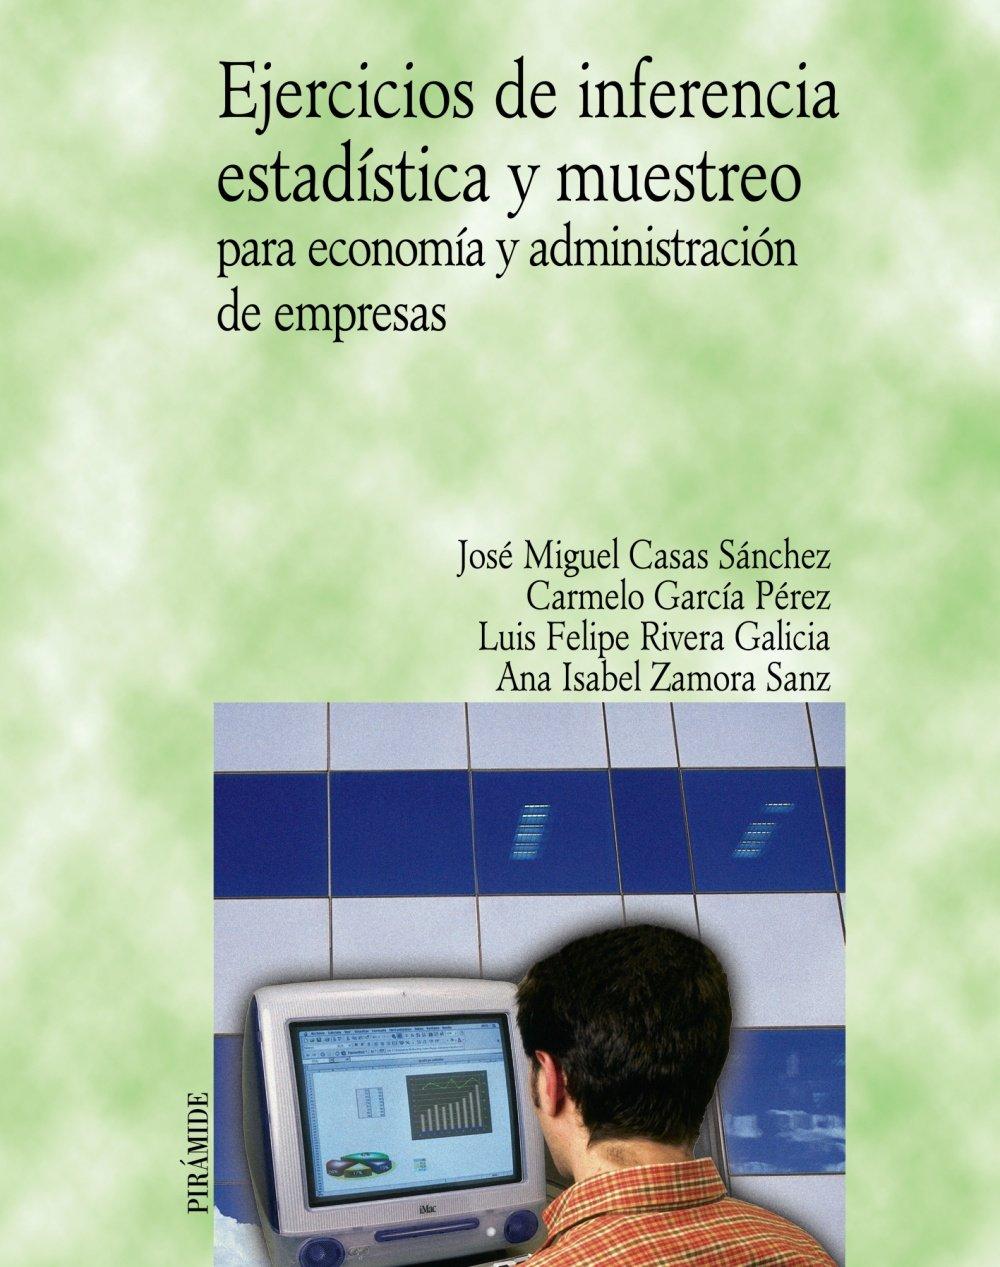 de empresas inference statistic exercises and economic and business economics and business spanish edition jose miguel casas sanchez